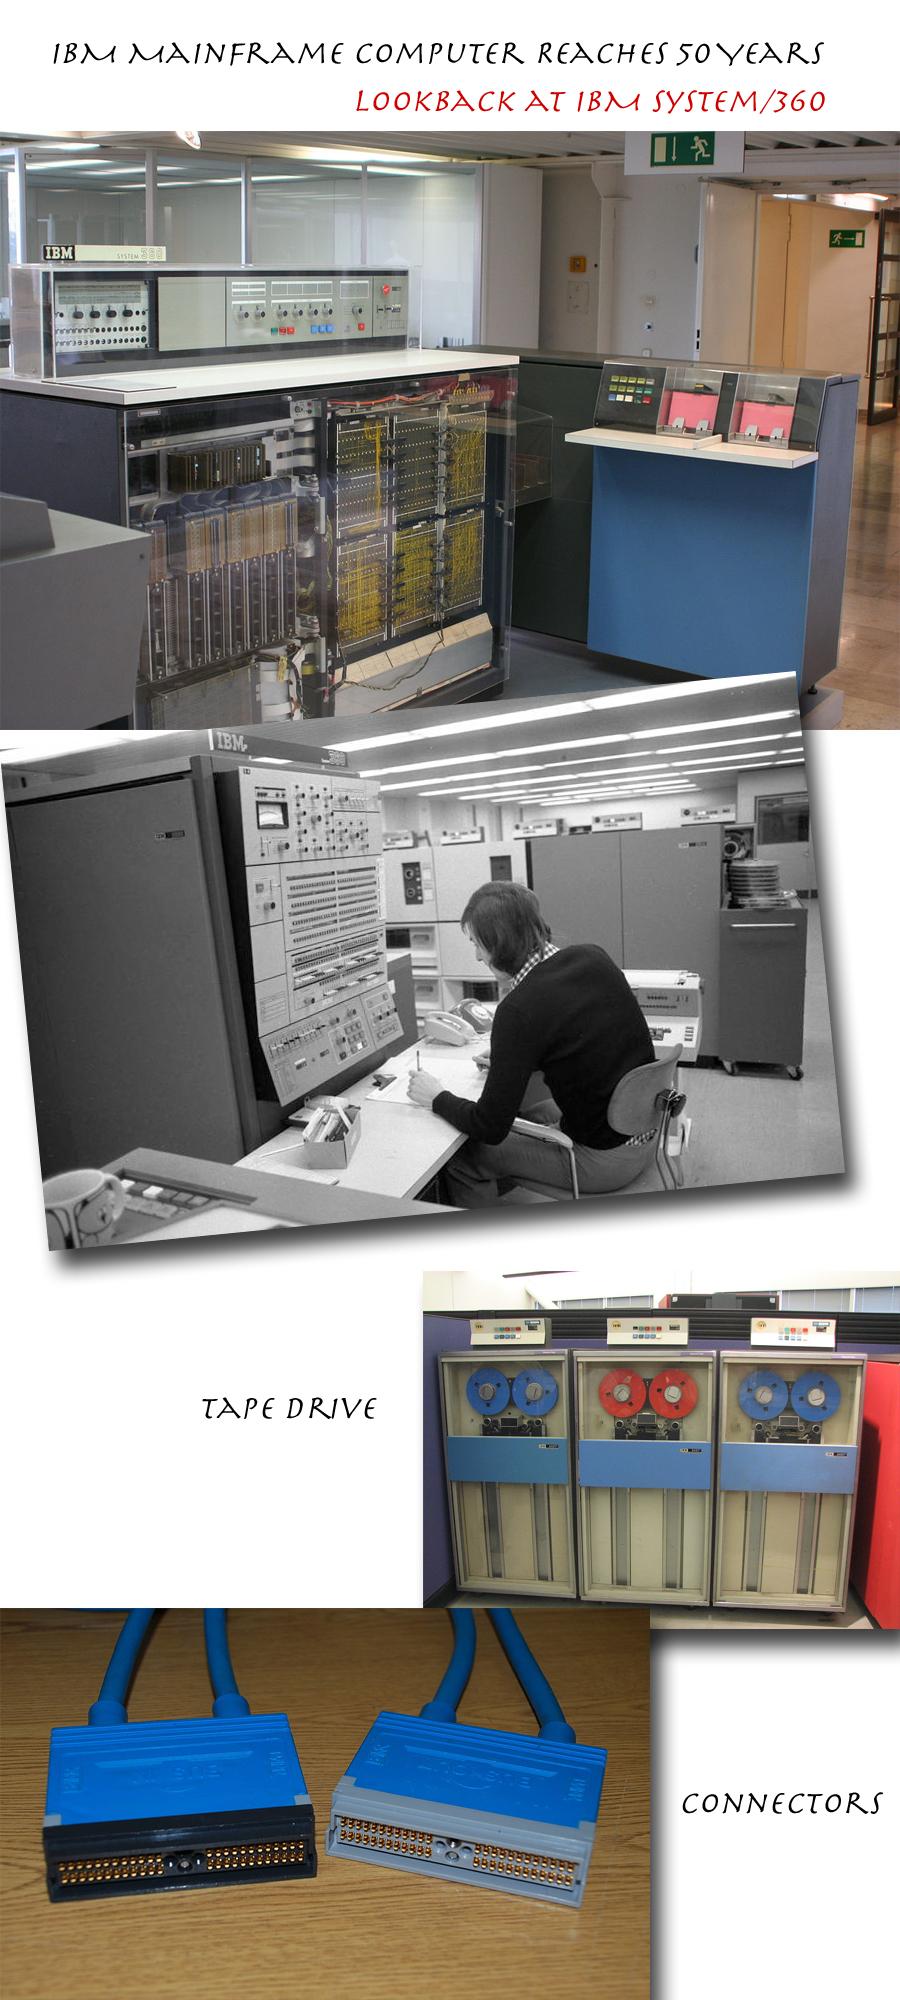 IBM-Mainframe-Computer-Reaches-50-Years